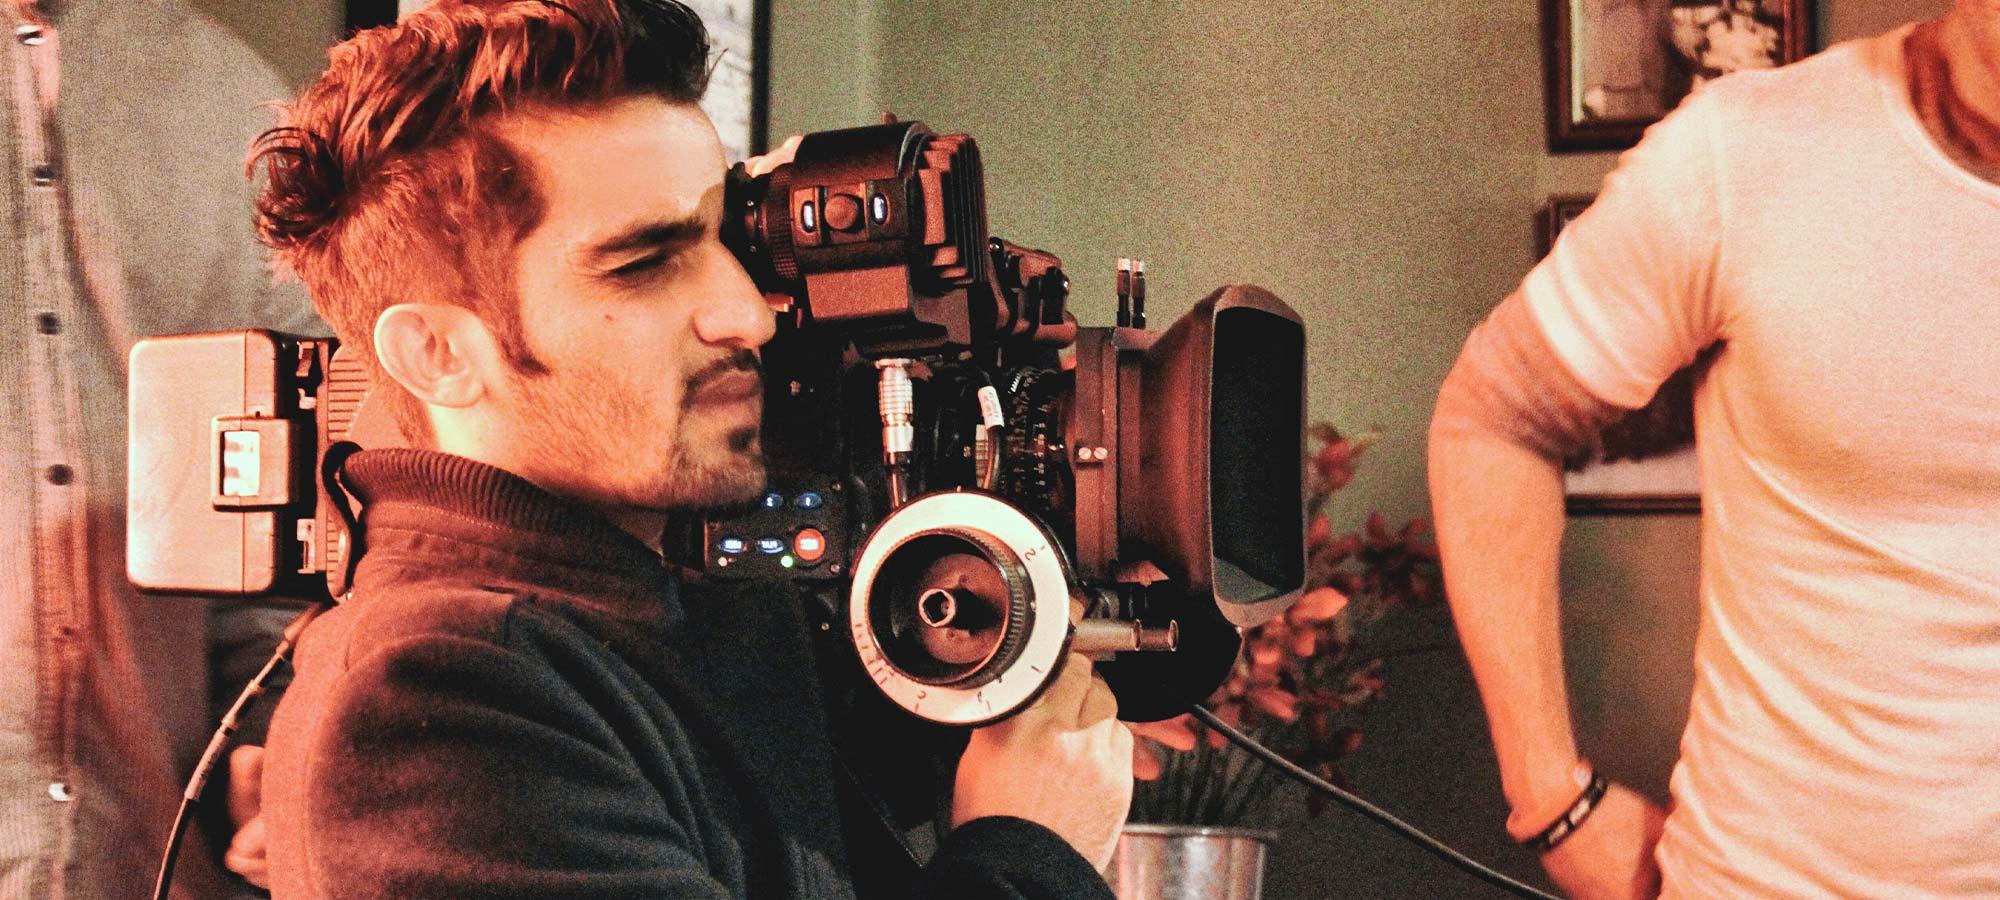 database-professionisti-imprese-lucana-film-commission-promozione-industria-audio-visivo-fiction-serie-tv-spot-documentari-regione-basilicata